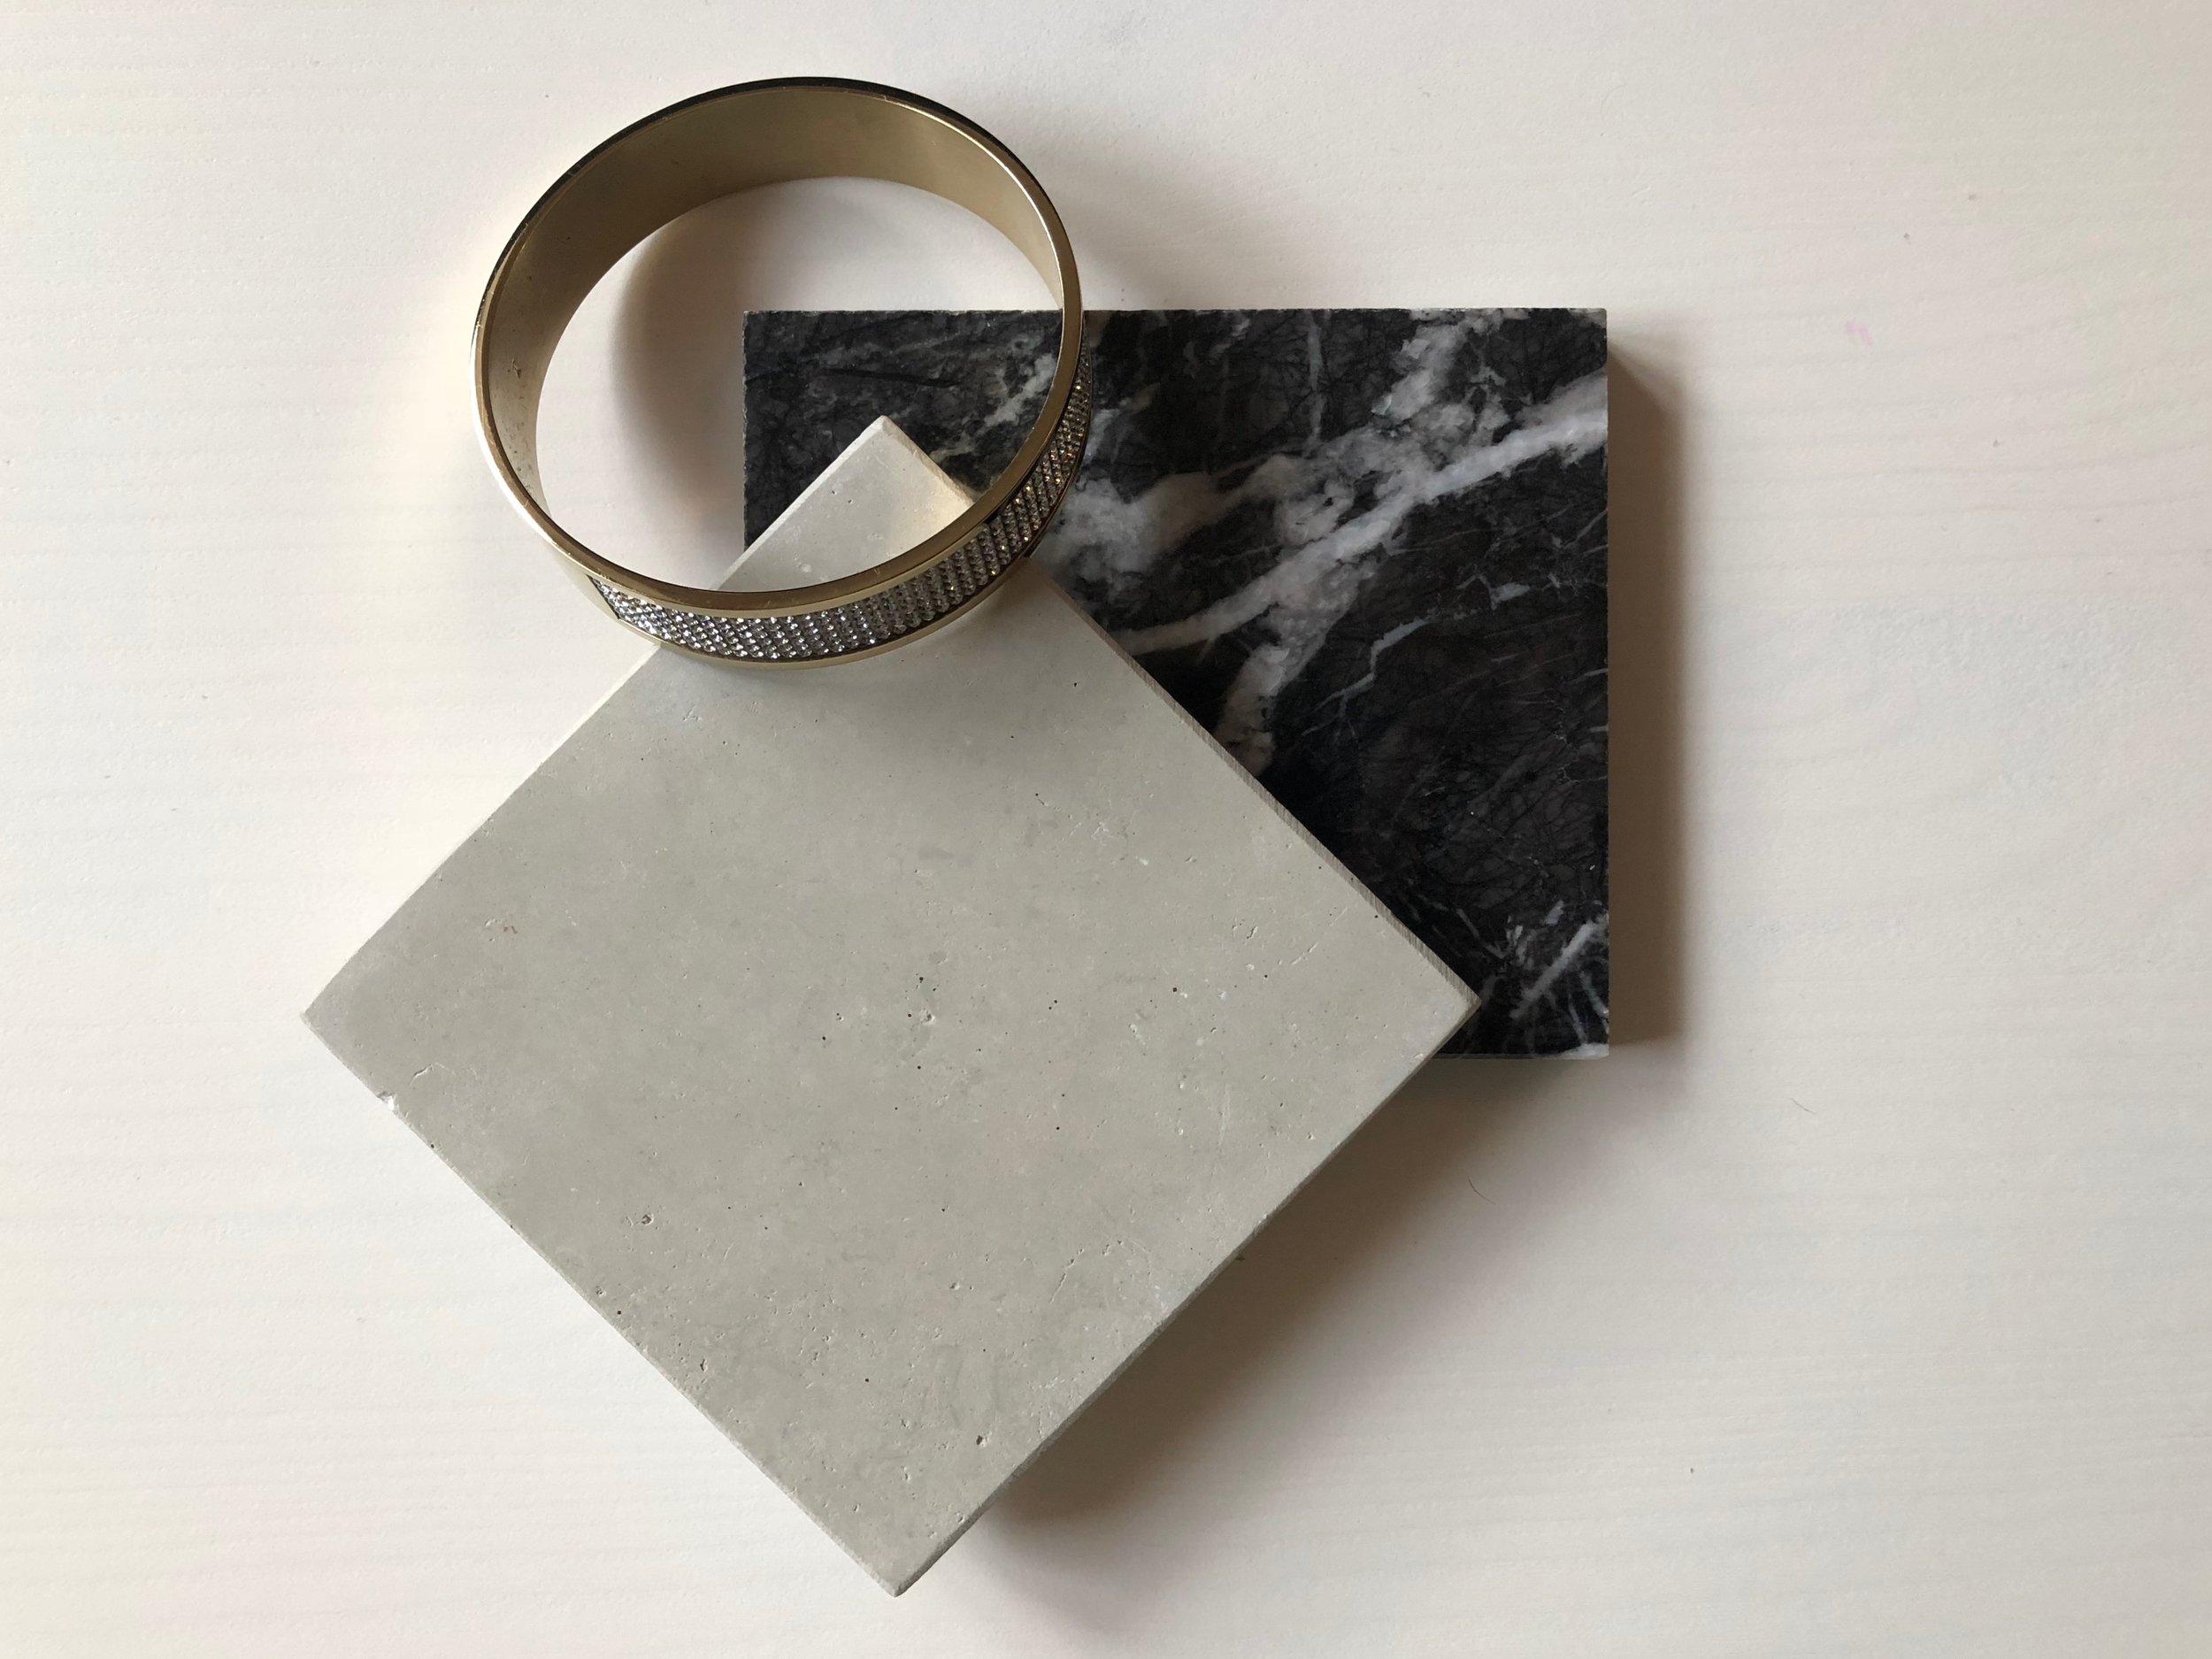 Alevik slipad. Nero Marquina marmor